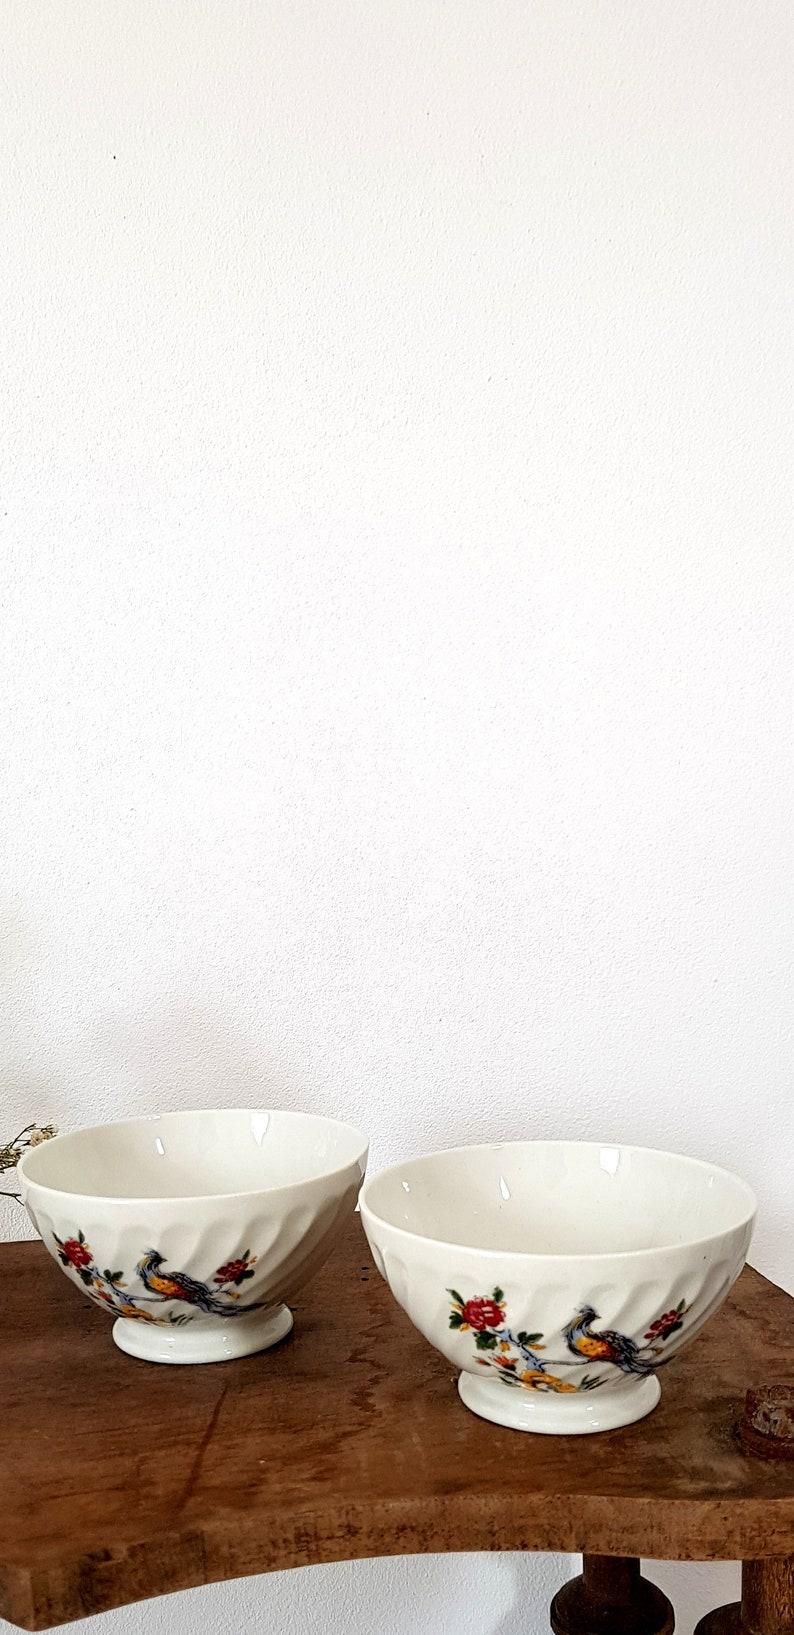 Set of 2 Small French Vintage White Porcelain Bowls Sarreguemines Birds